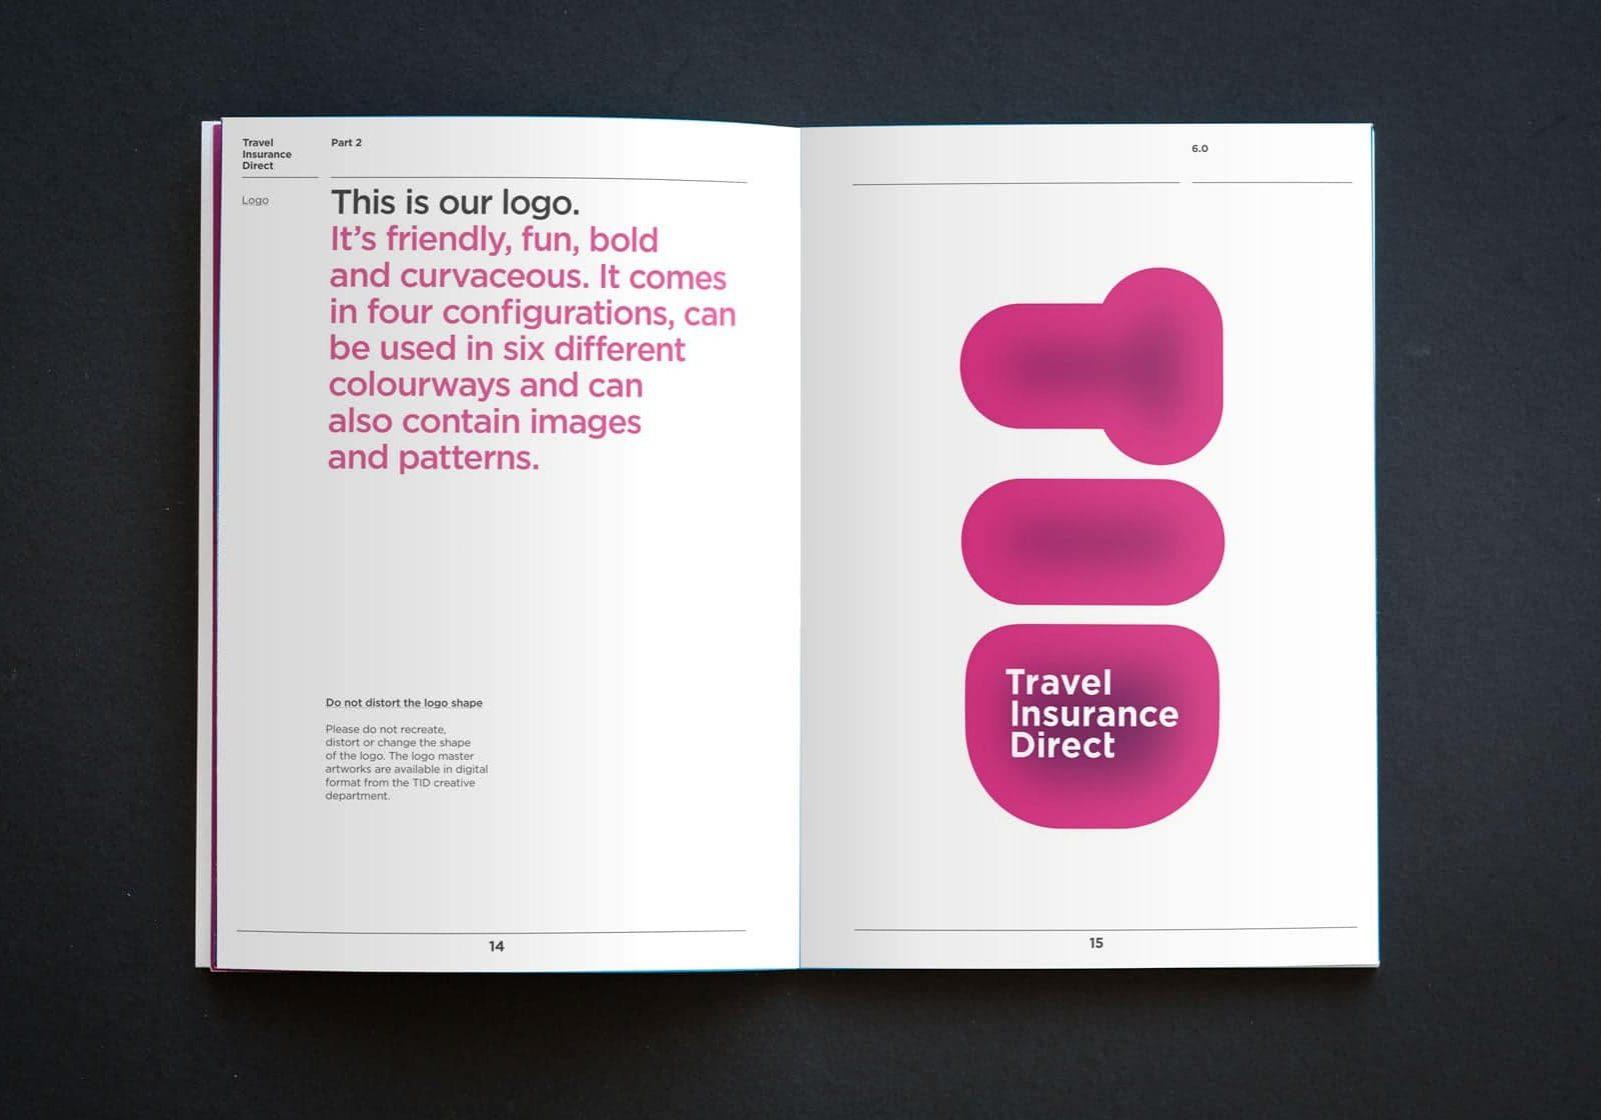 TID-Brandbook-Pages-14-15